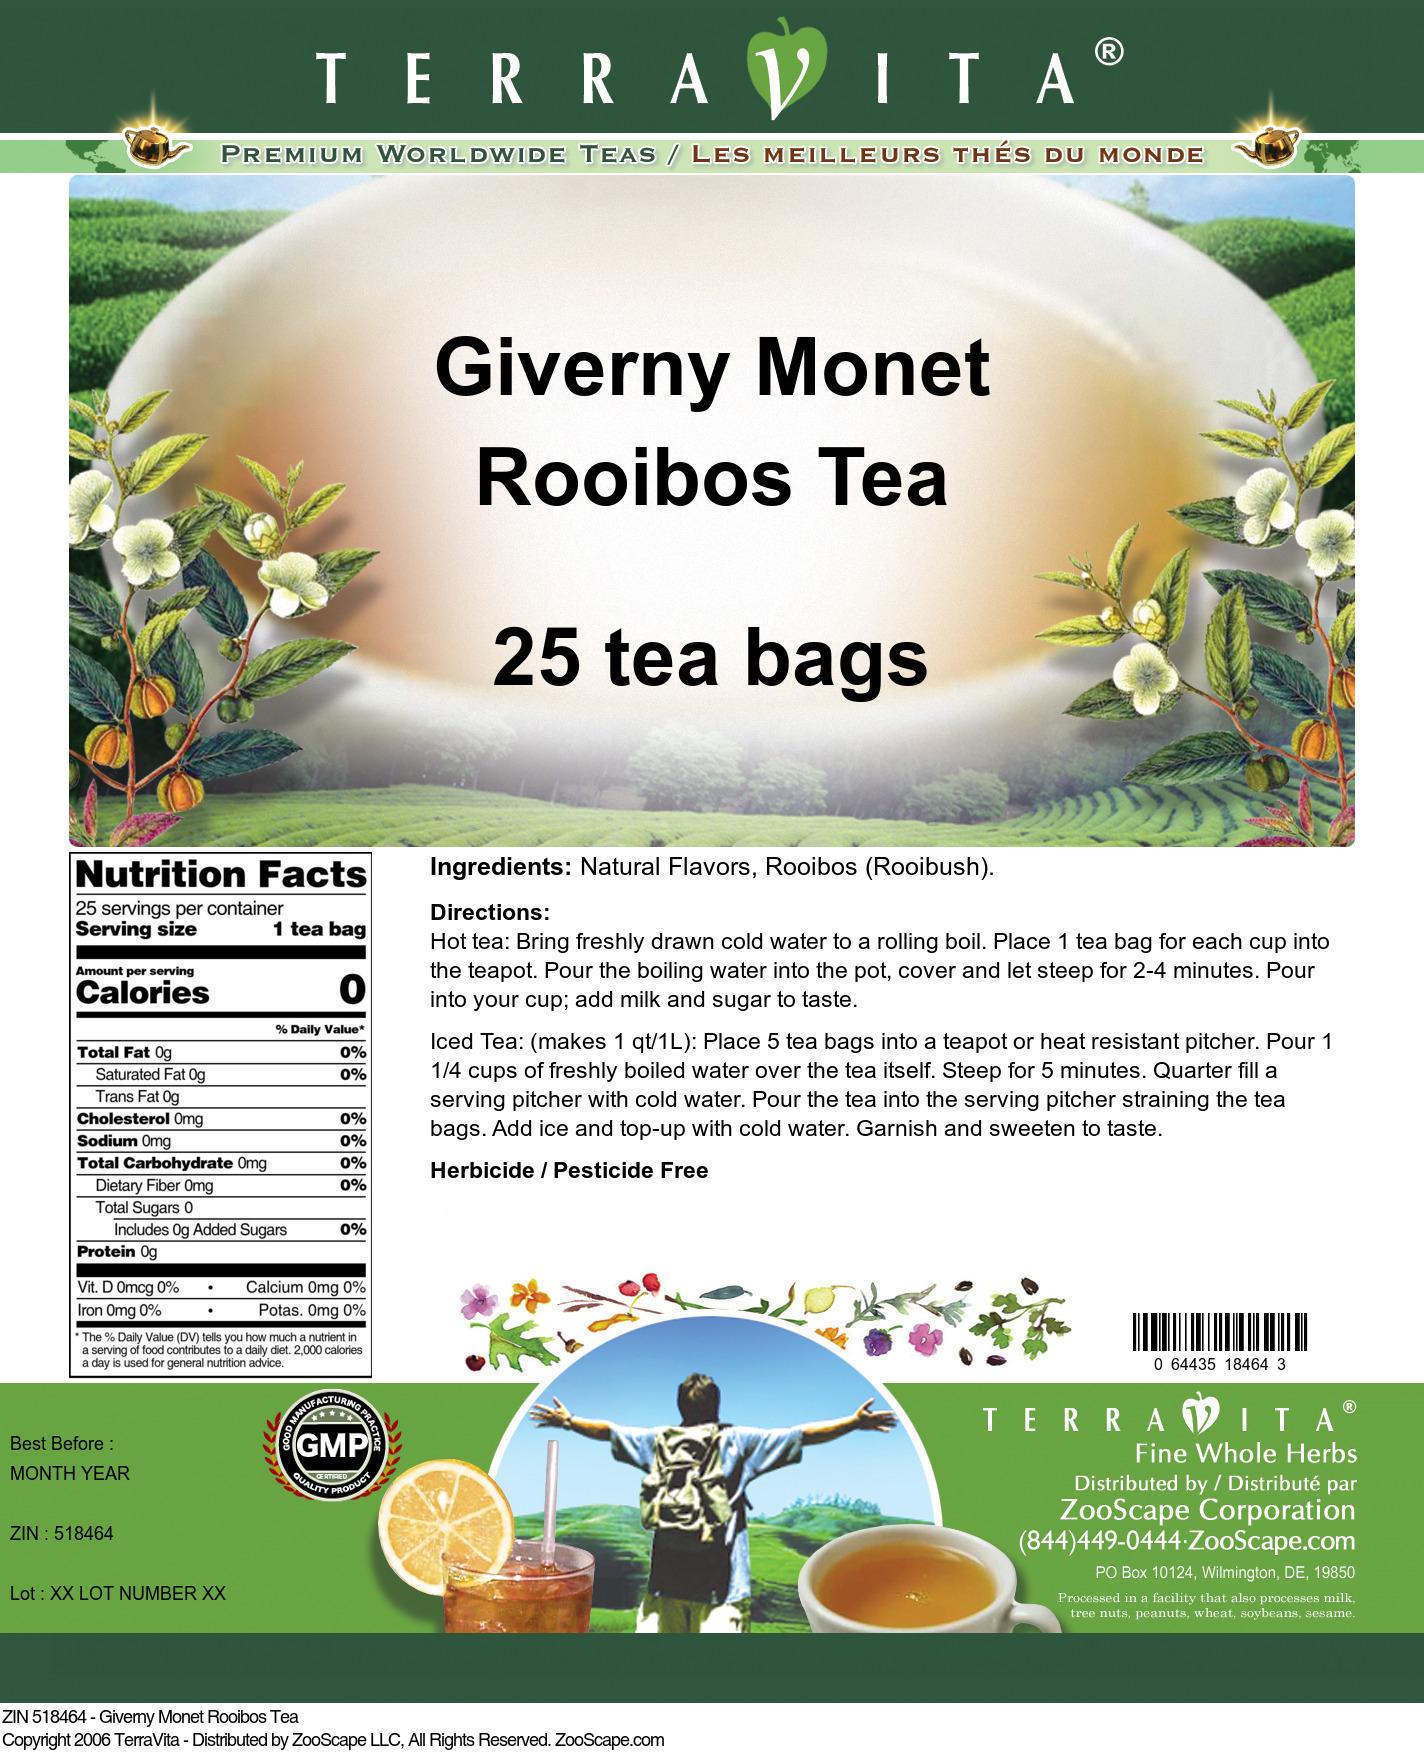 Giverny Monet Rooibos Tea